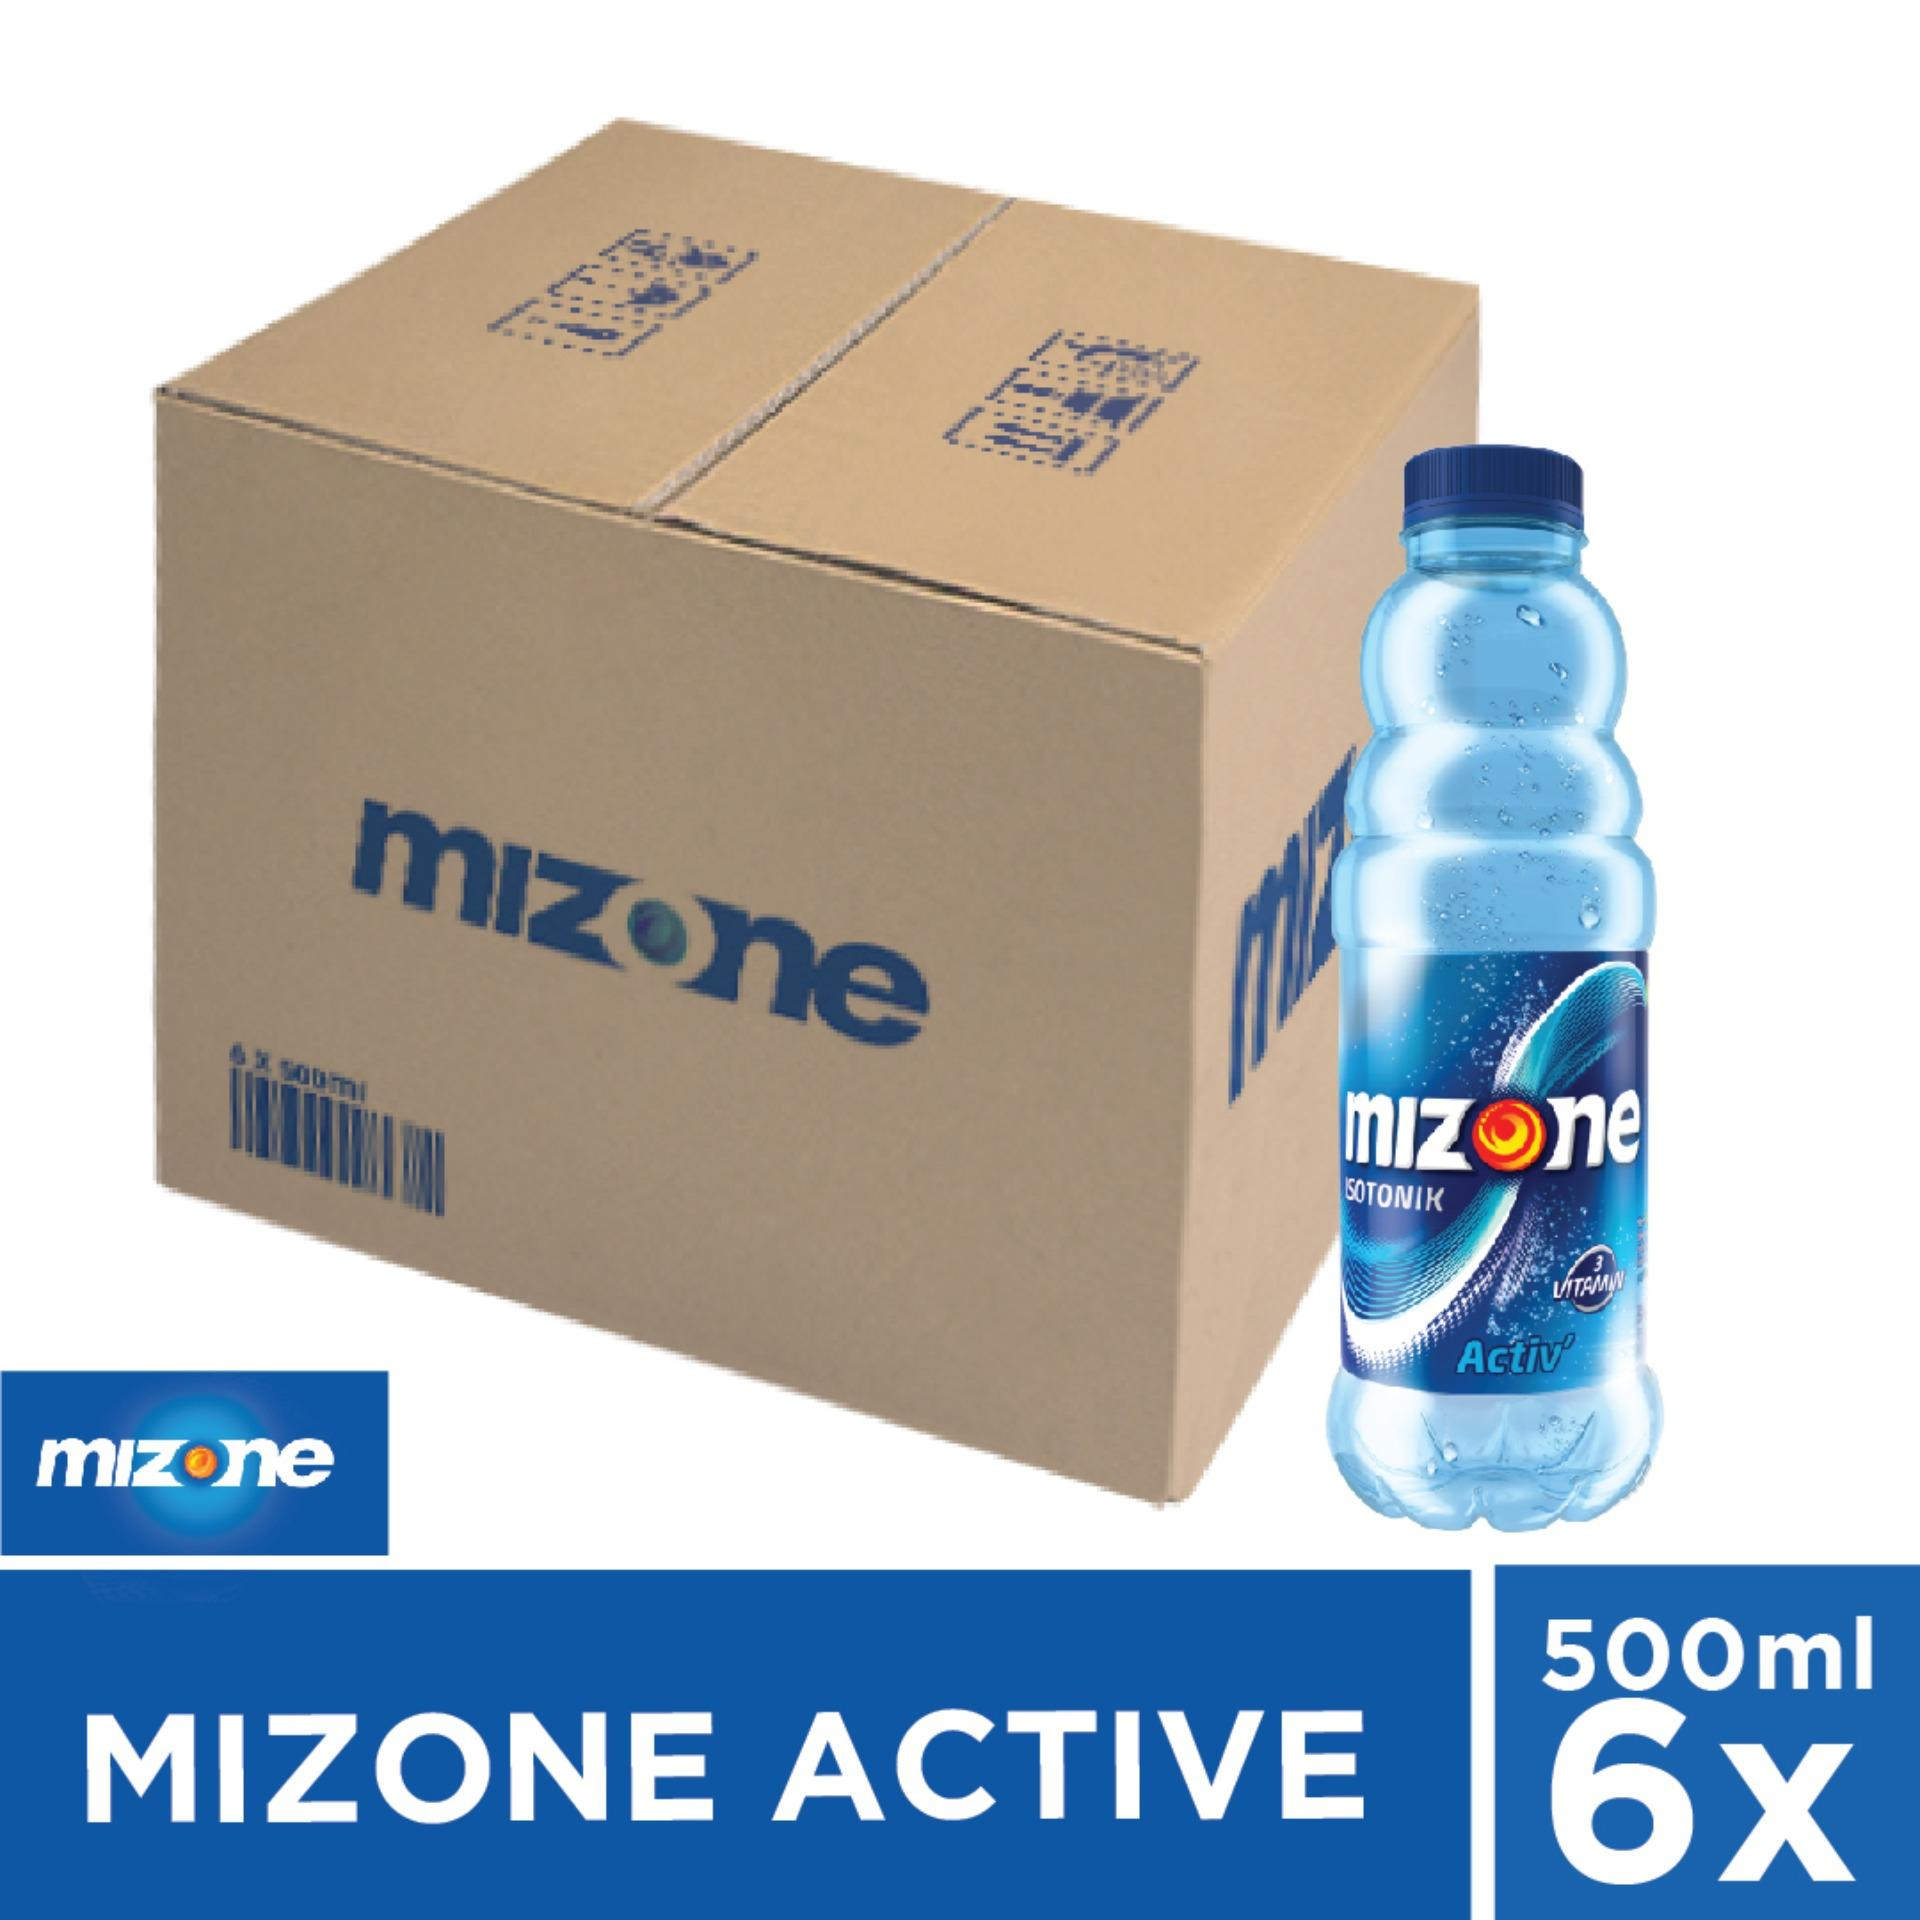 Kehebatan Nestle Milo Activ Go 1 5kg Minuman Malt Coklat Malaysia Susu Kg Free Shipping Mizone Isotonik Bernutrisi 500ml 6 X 500 Ml